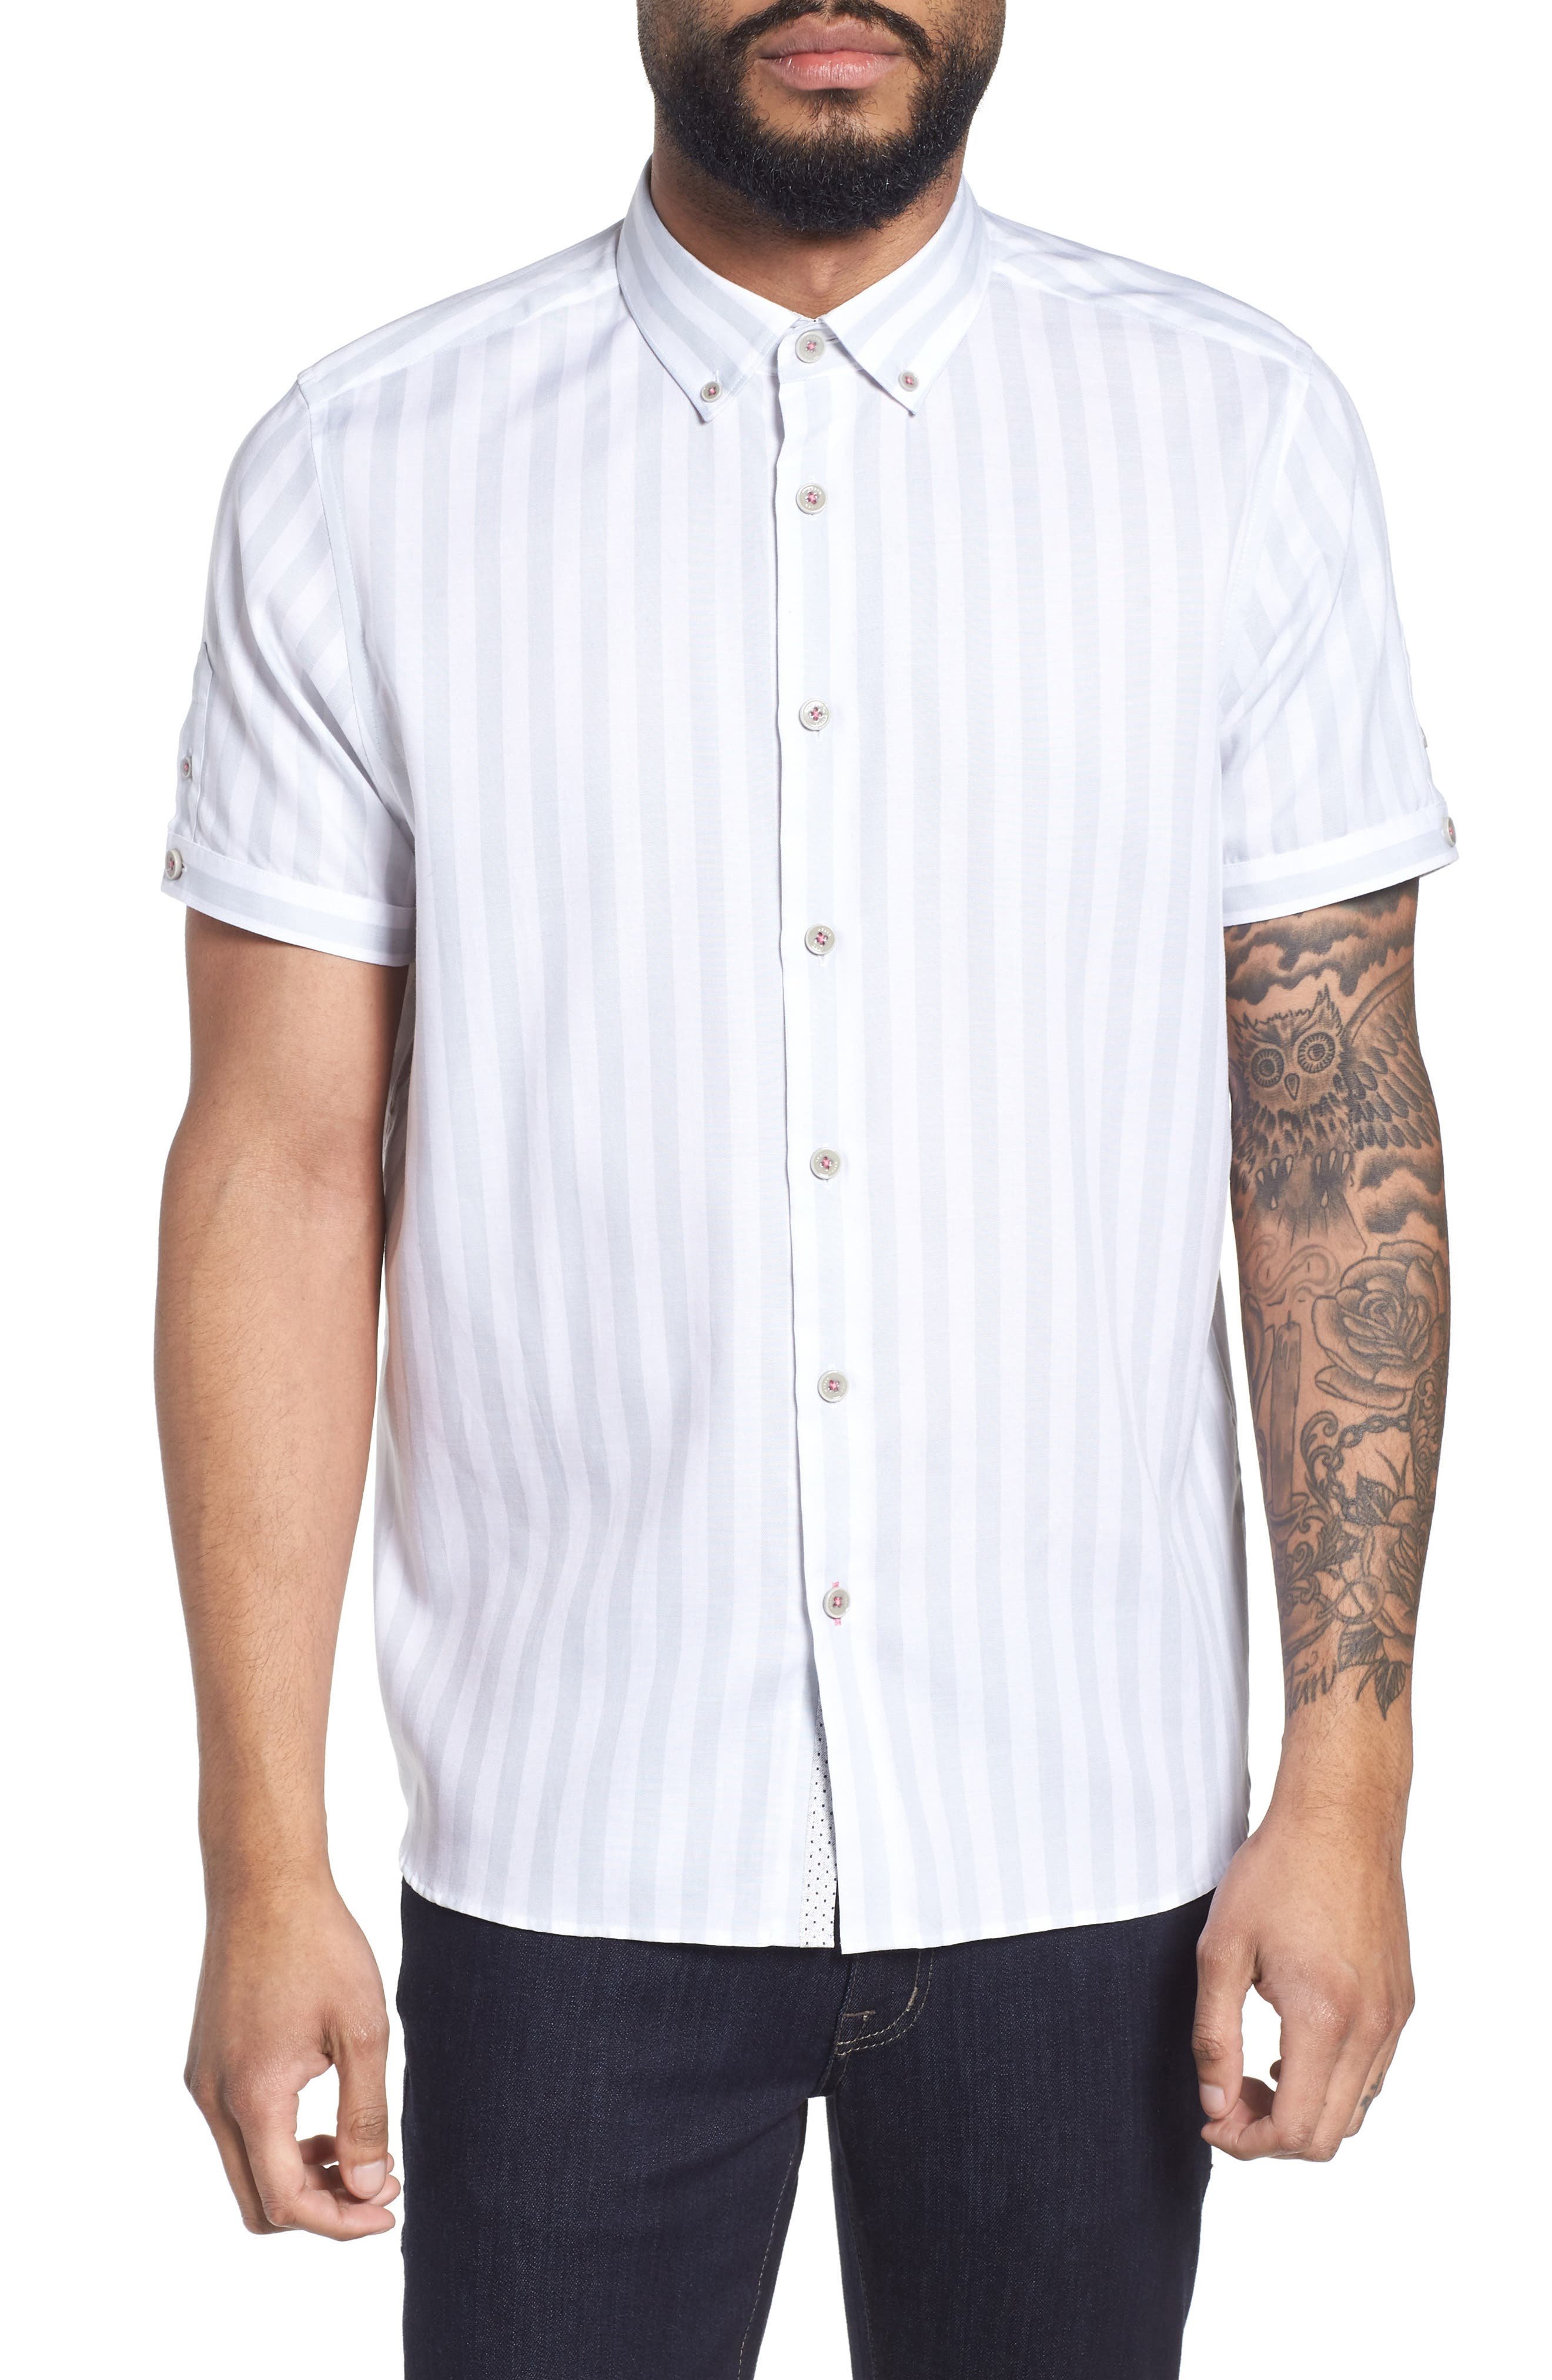 TED BAKER LONDON Vertical Stripe Trim Fit Short Sleeve Sport Shirt, Main, color, 311